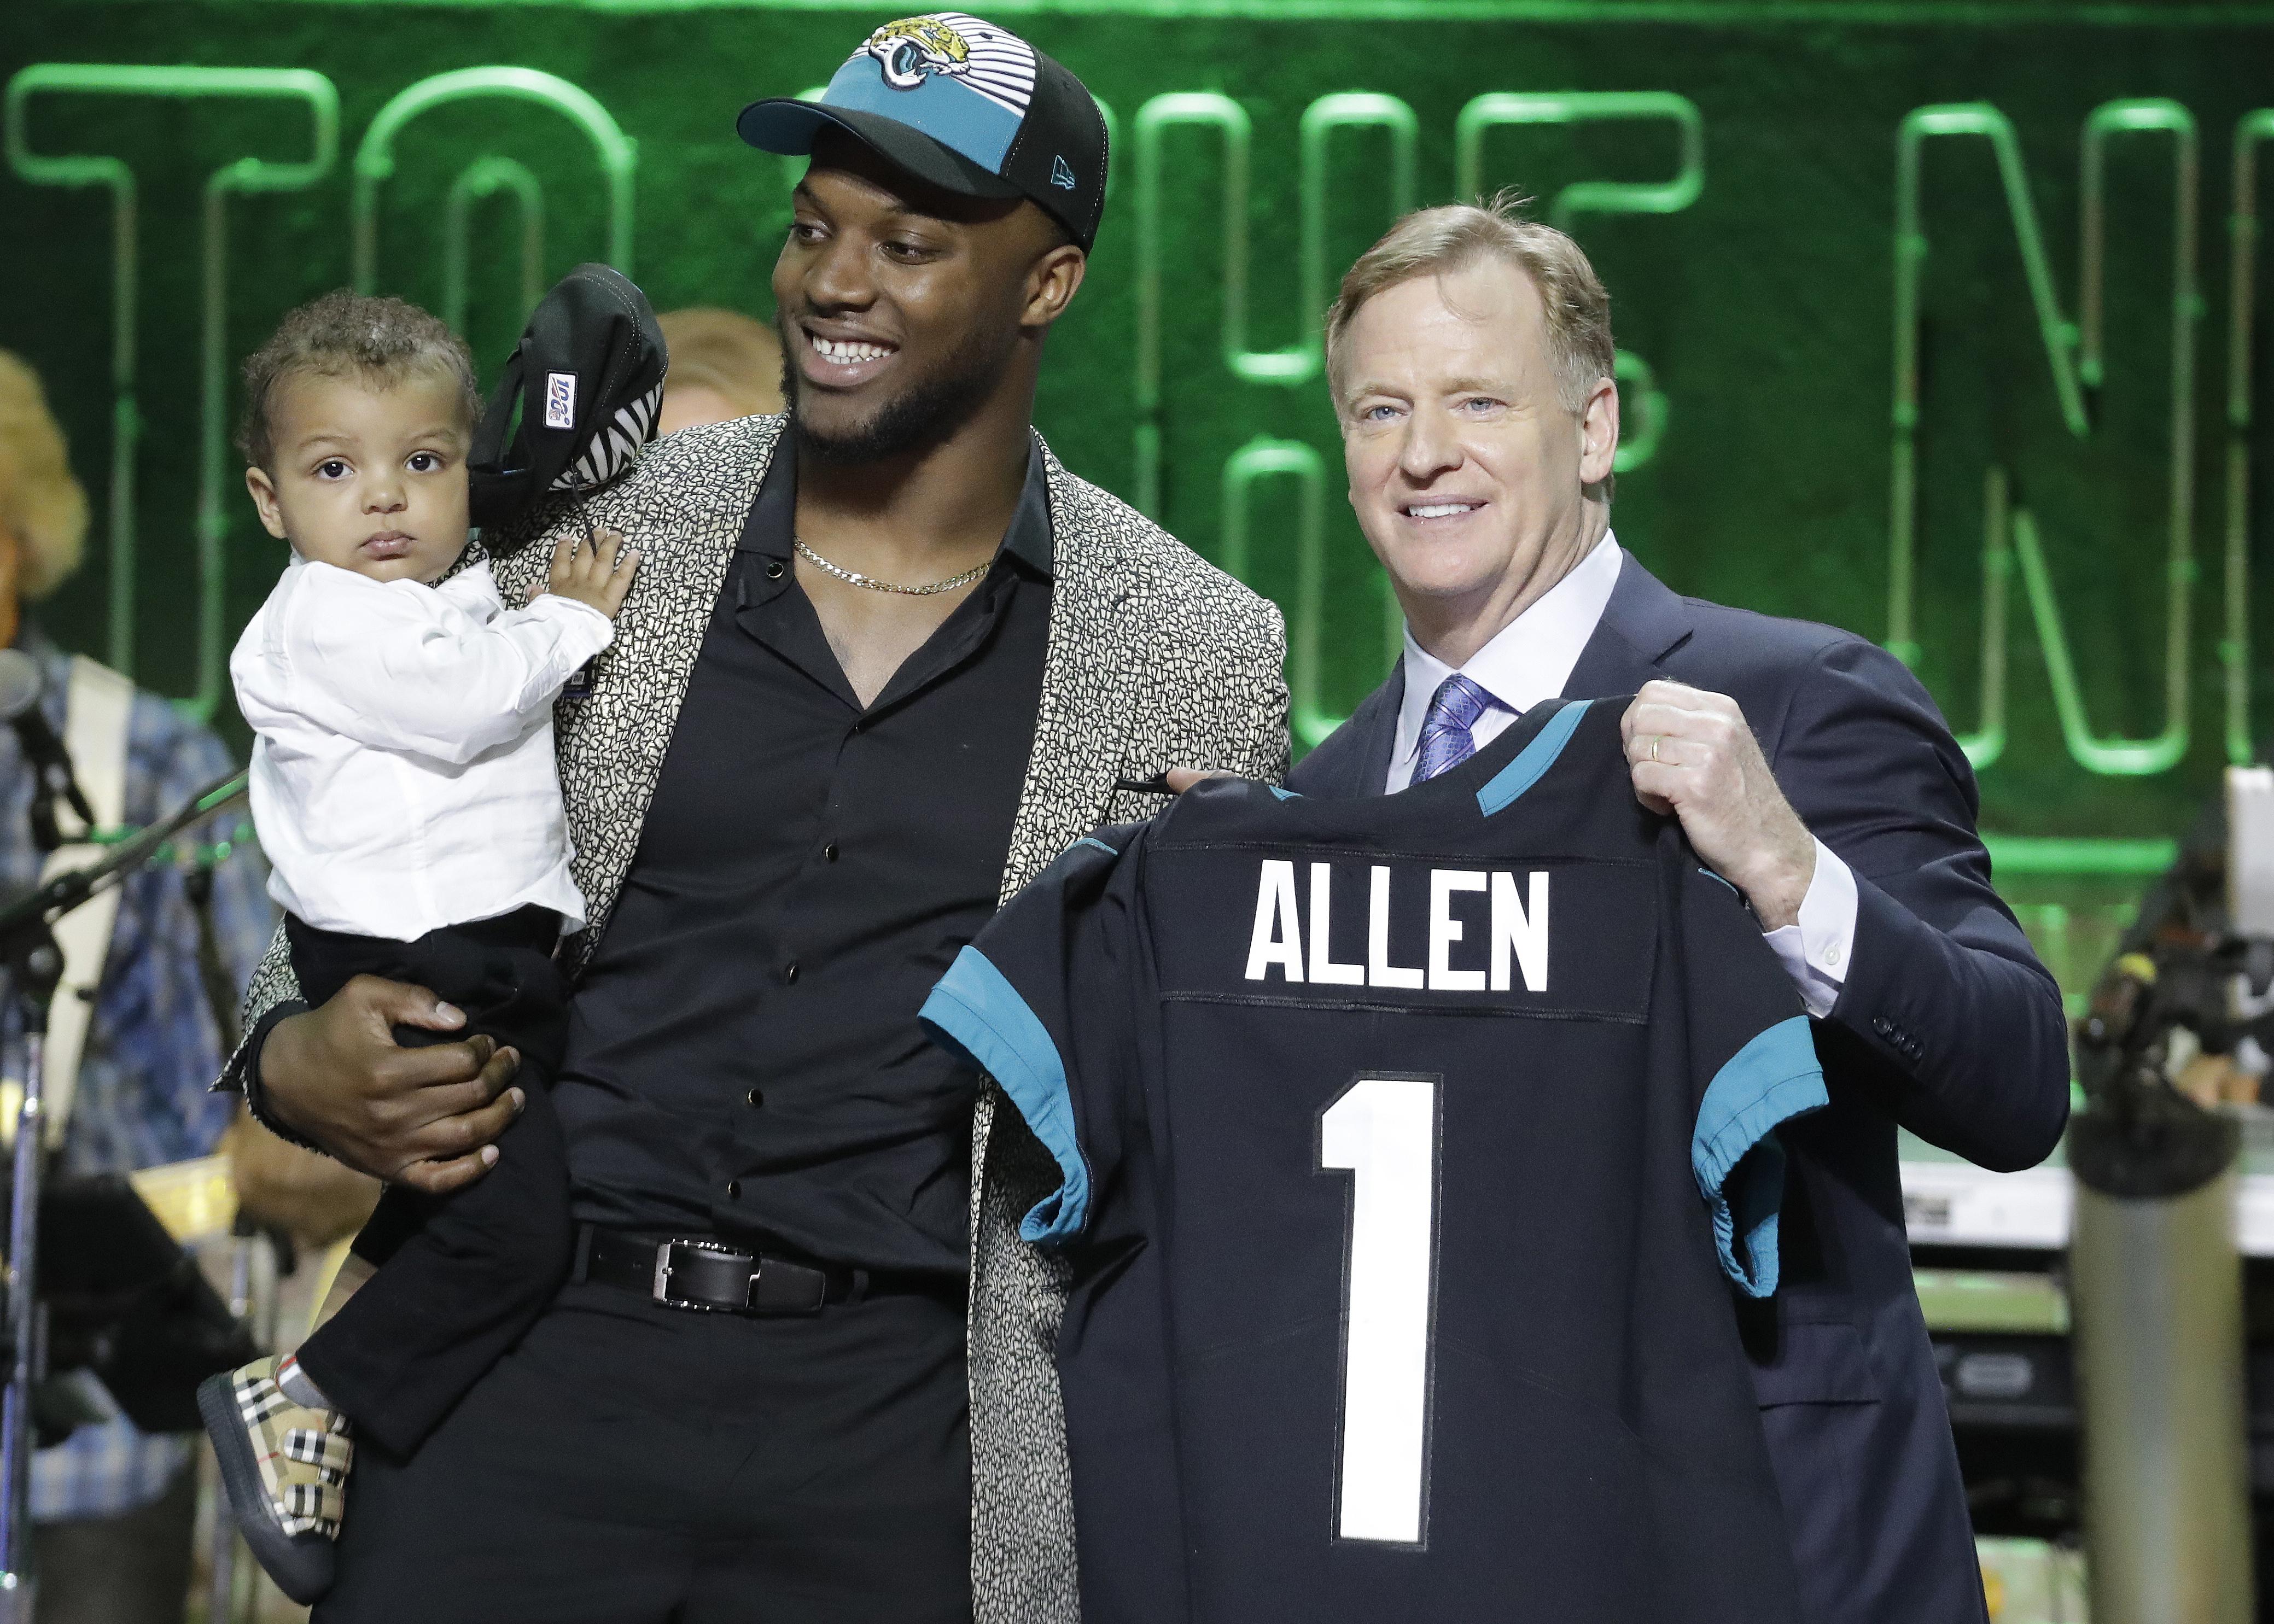 Jaguars add to defense by drafting Kentucky's Josh Allen